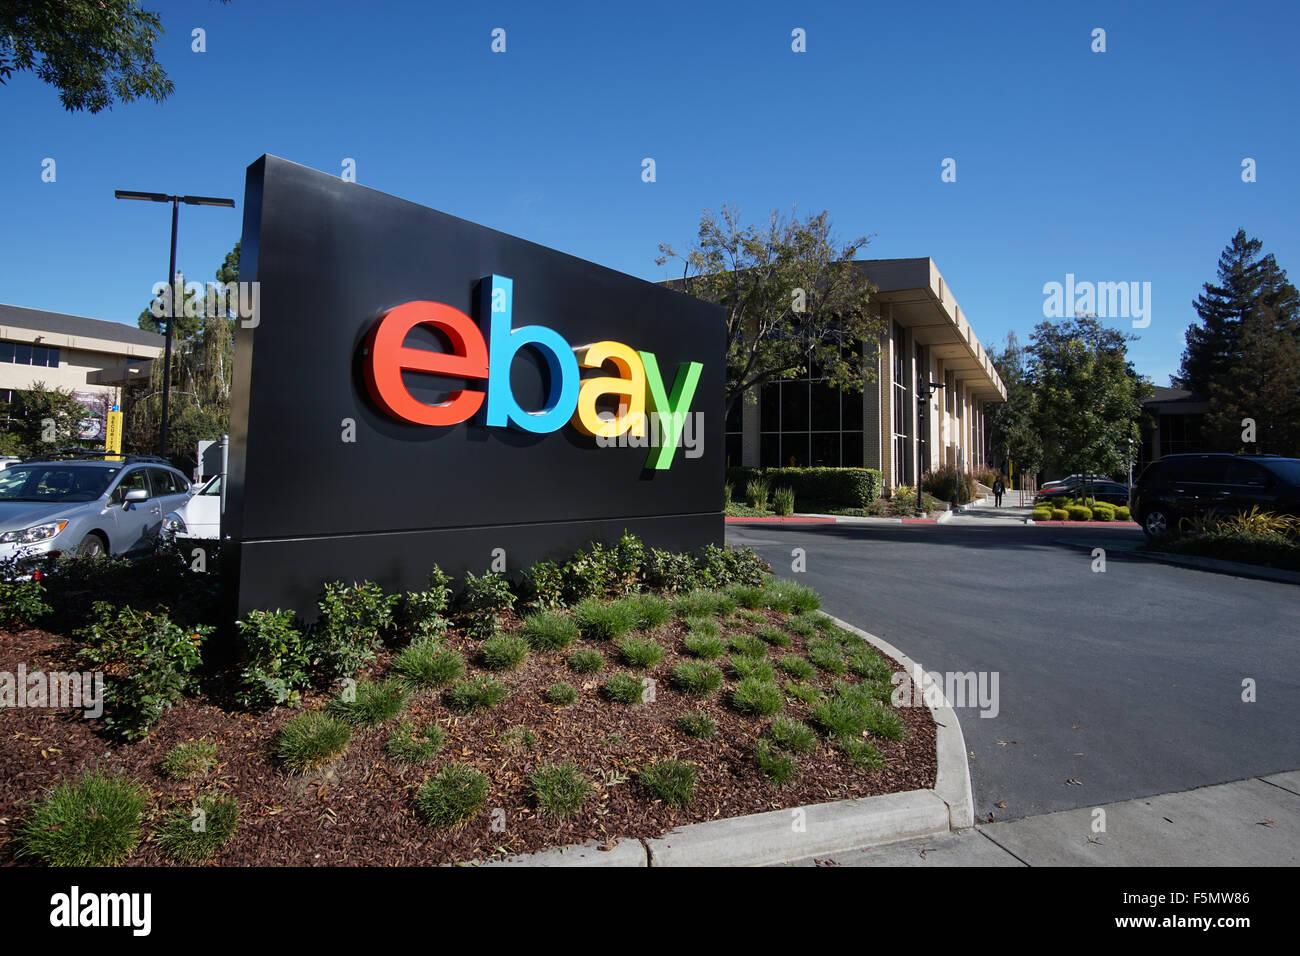 Ebay Campus In San Jose Ca Stock Photo Alamy